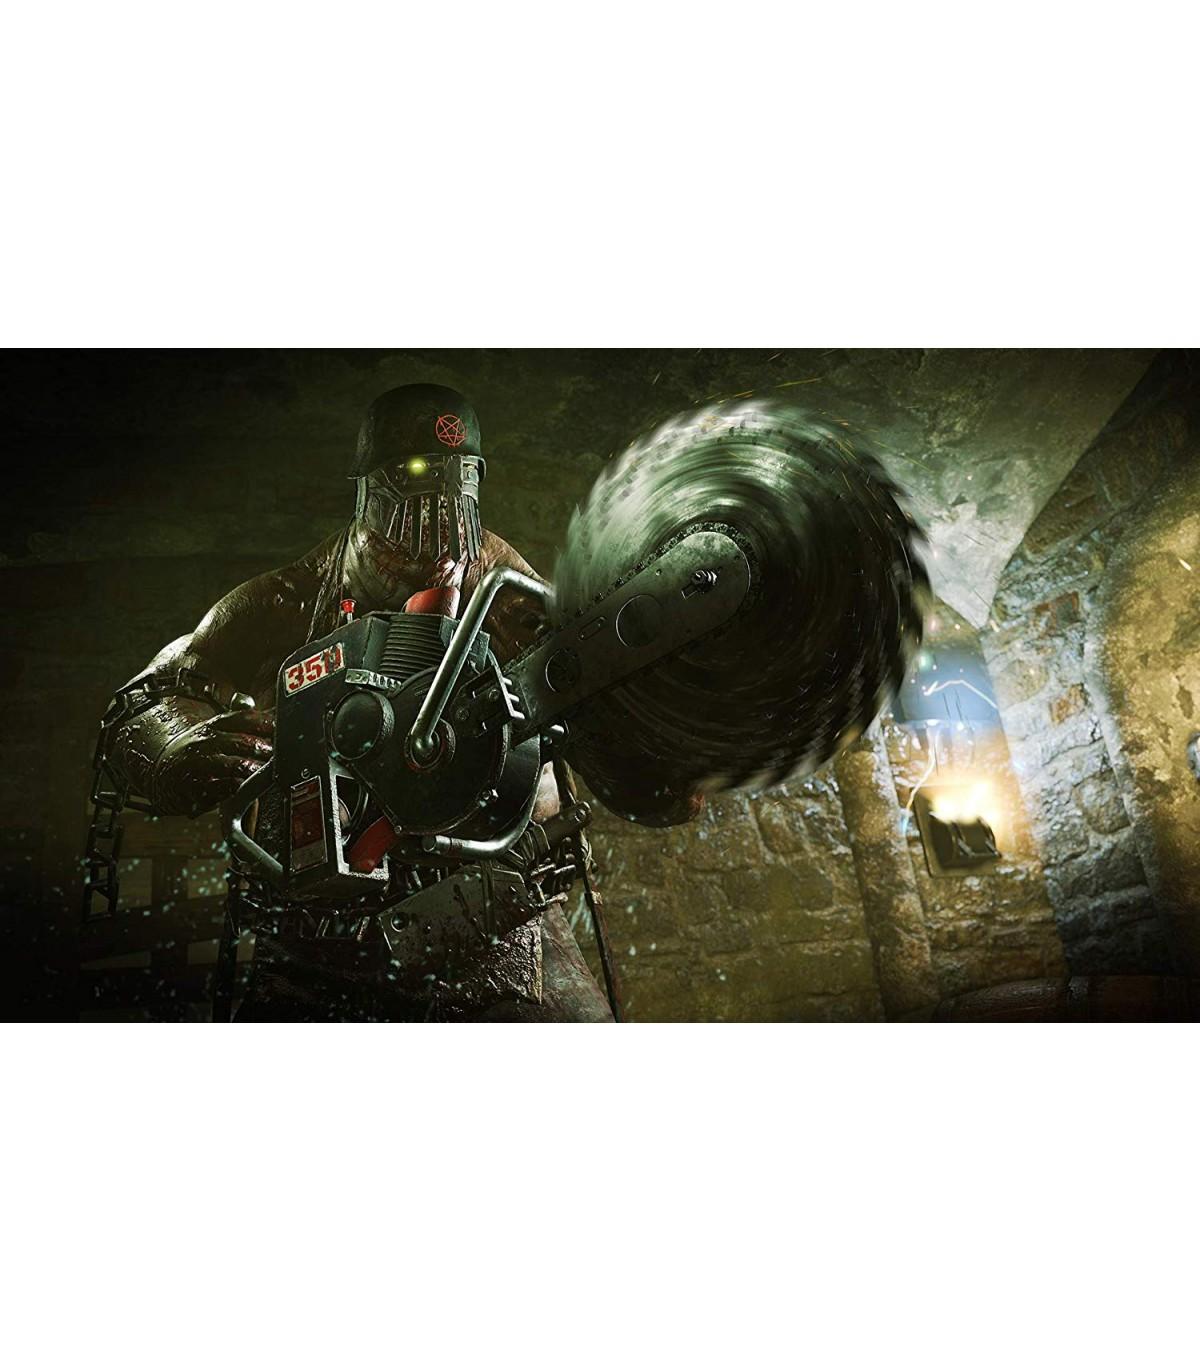 بازی Zombie Army 4: Dead War - ایکس باکس وان